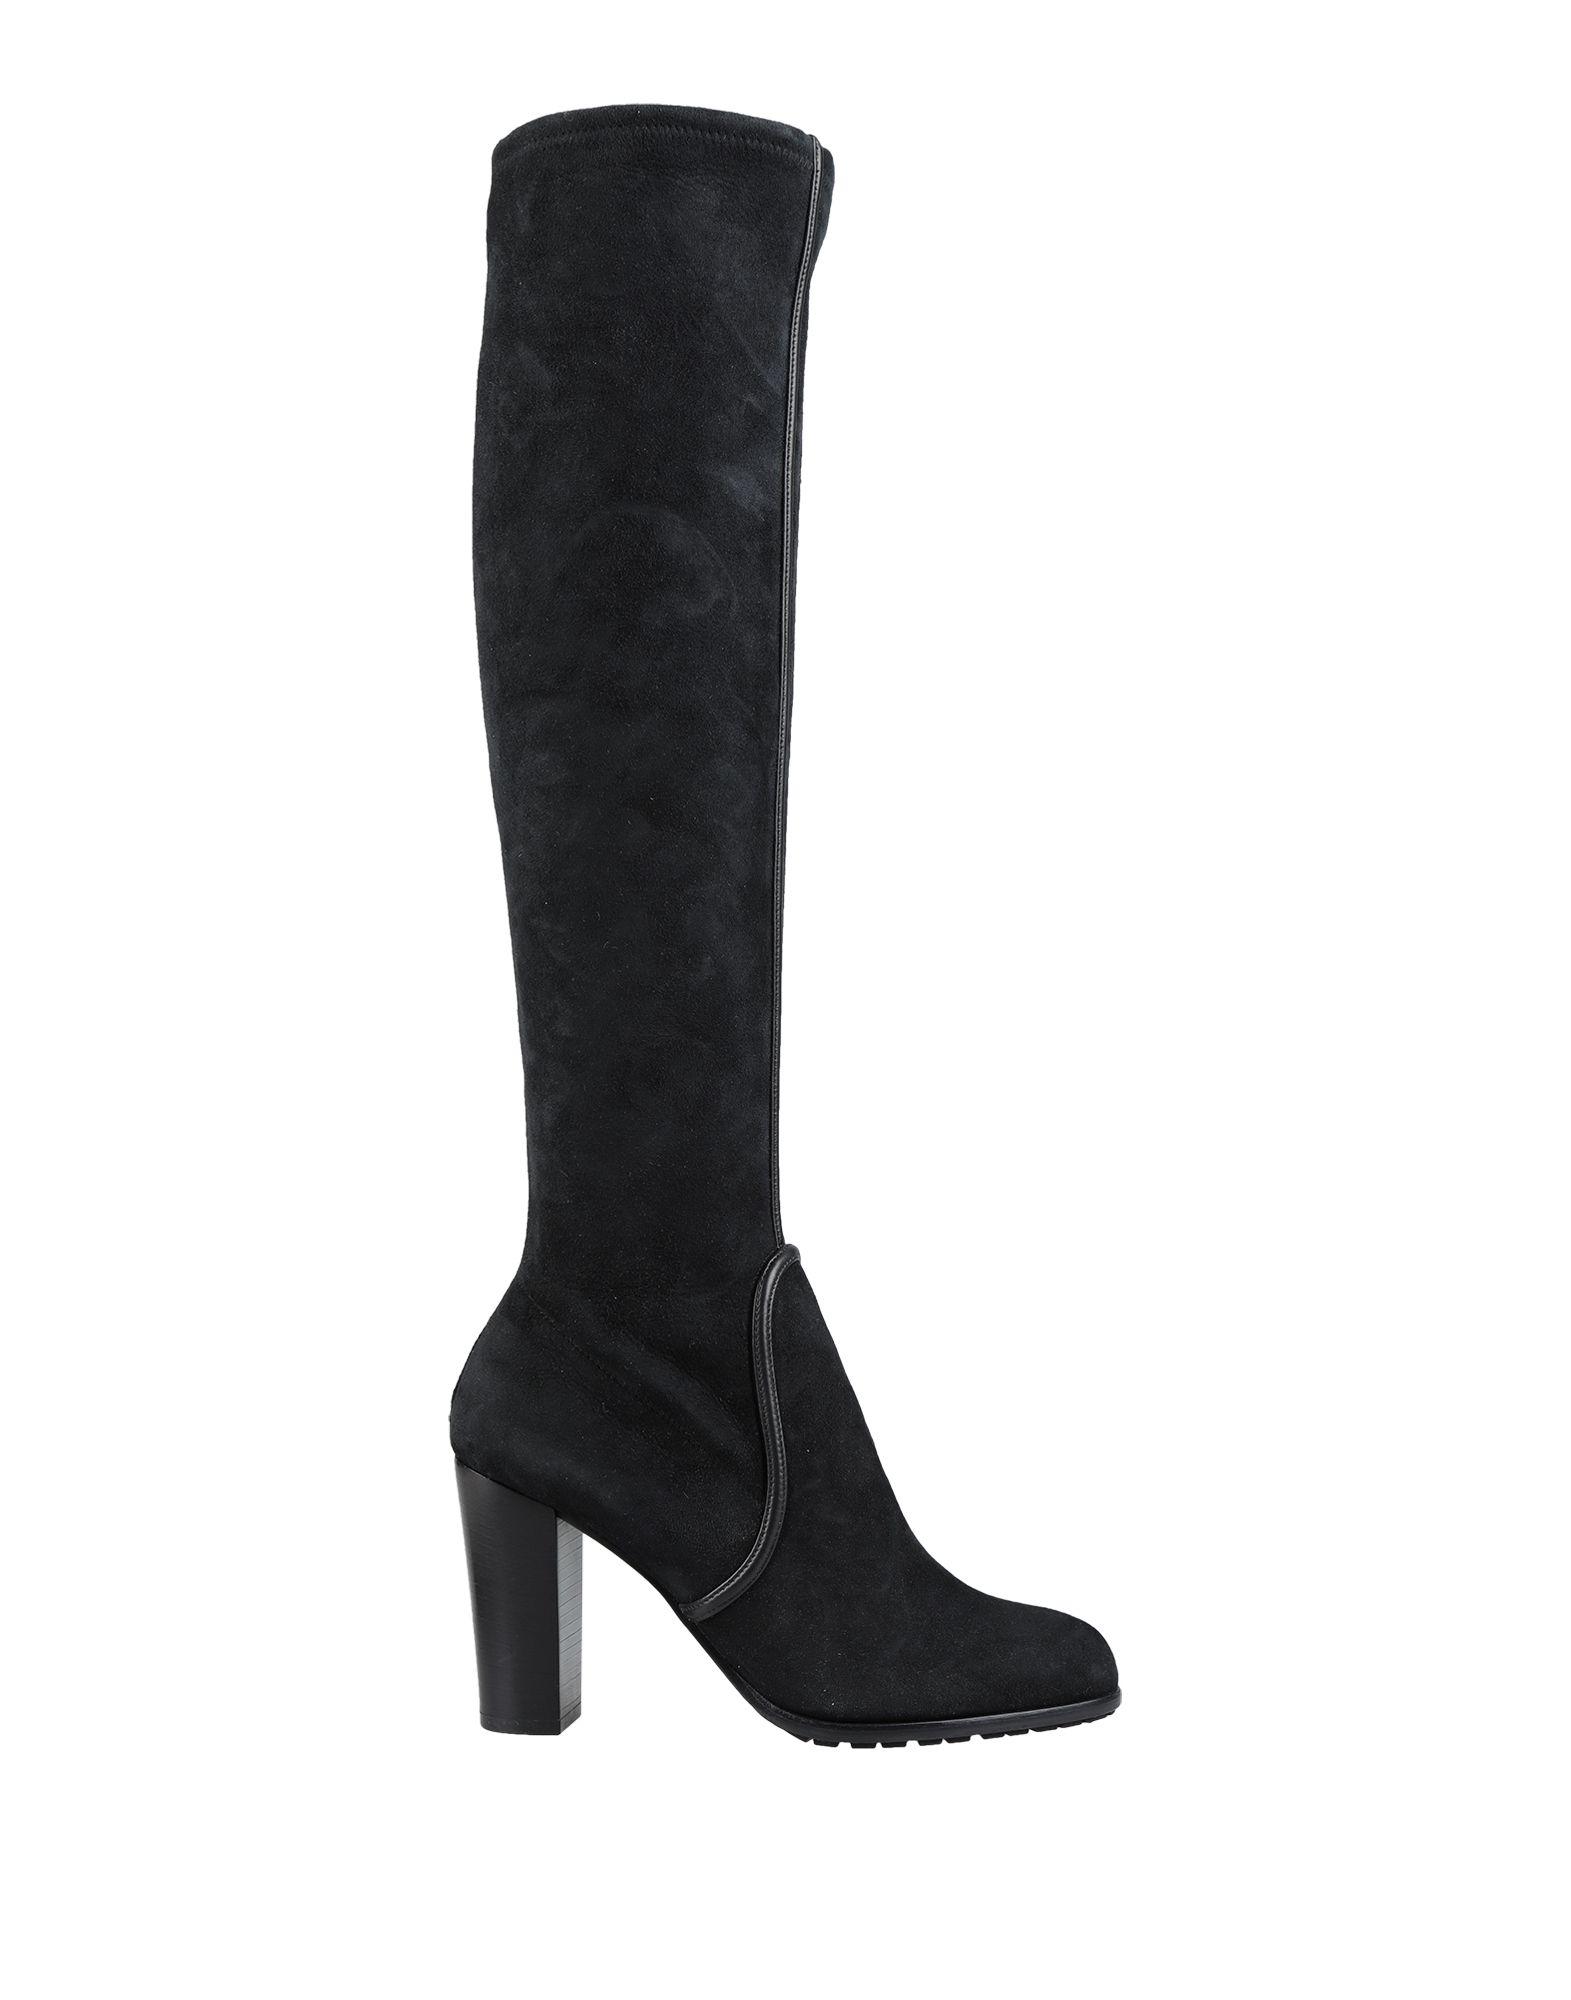 Sergio Rossi Rossi Boots - Women Sergio Rossi Rossi Boots online on  United Kingdom - 11568131NC fee3f0